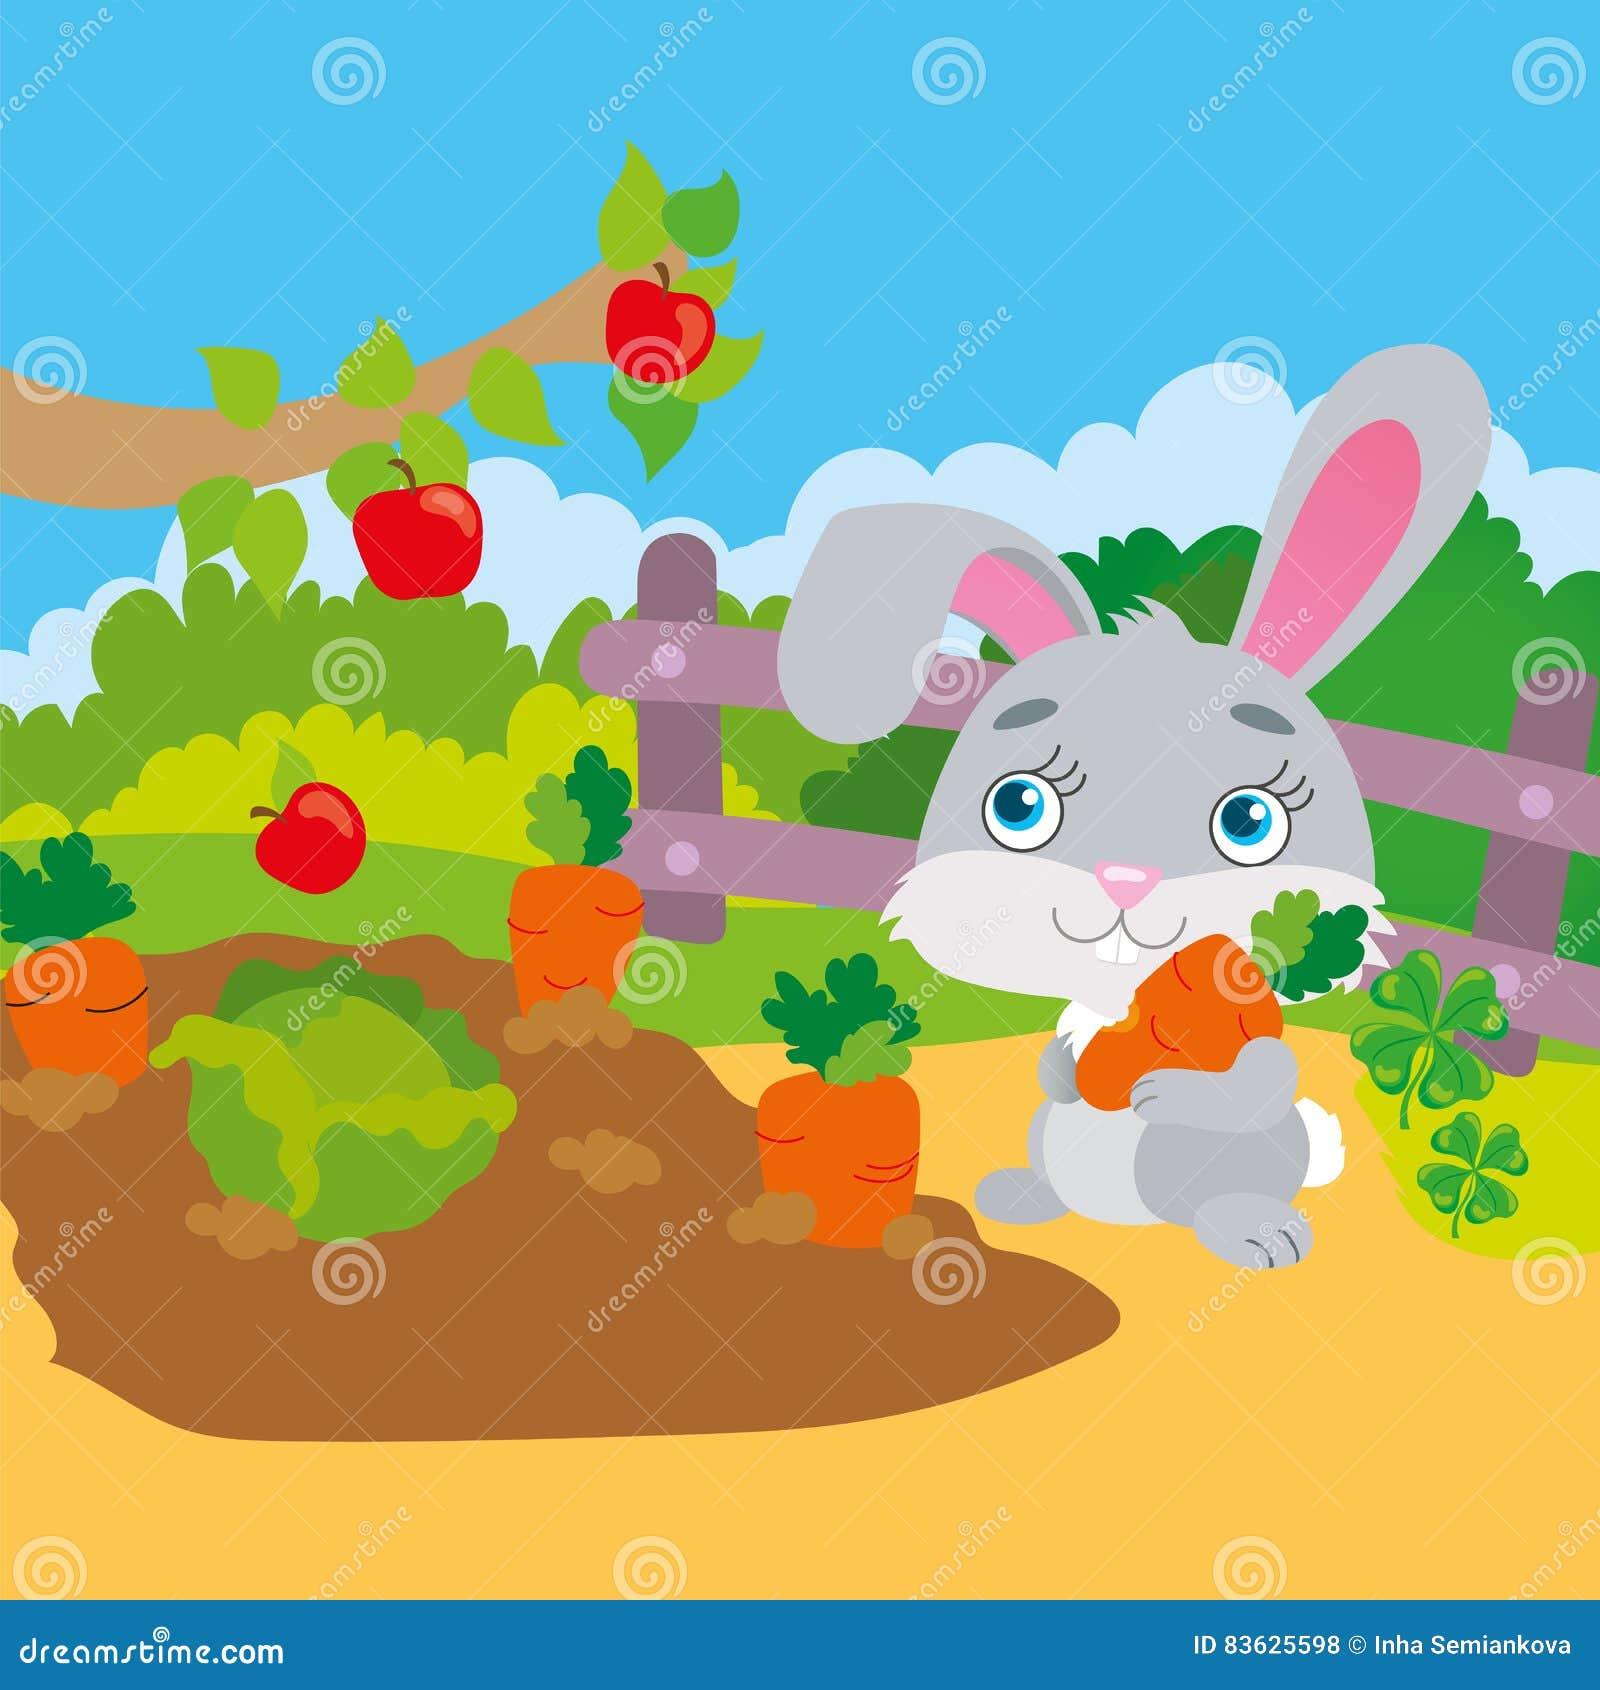 Rabbit Gnawing Carrot In Garden